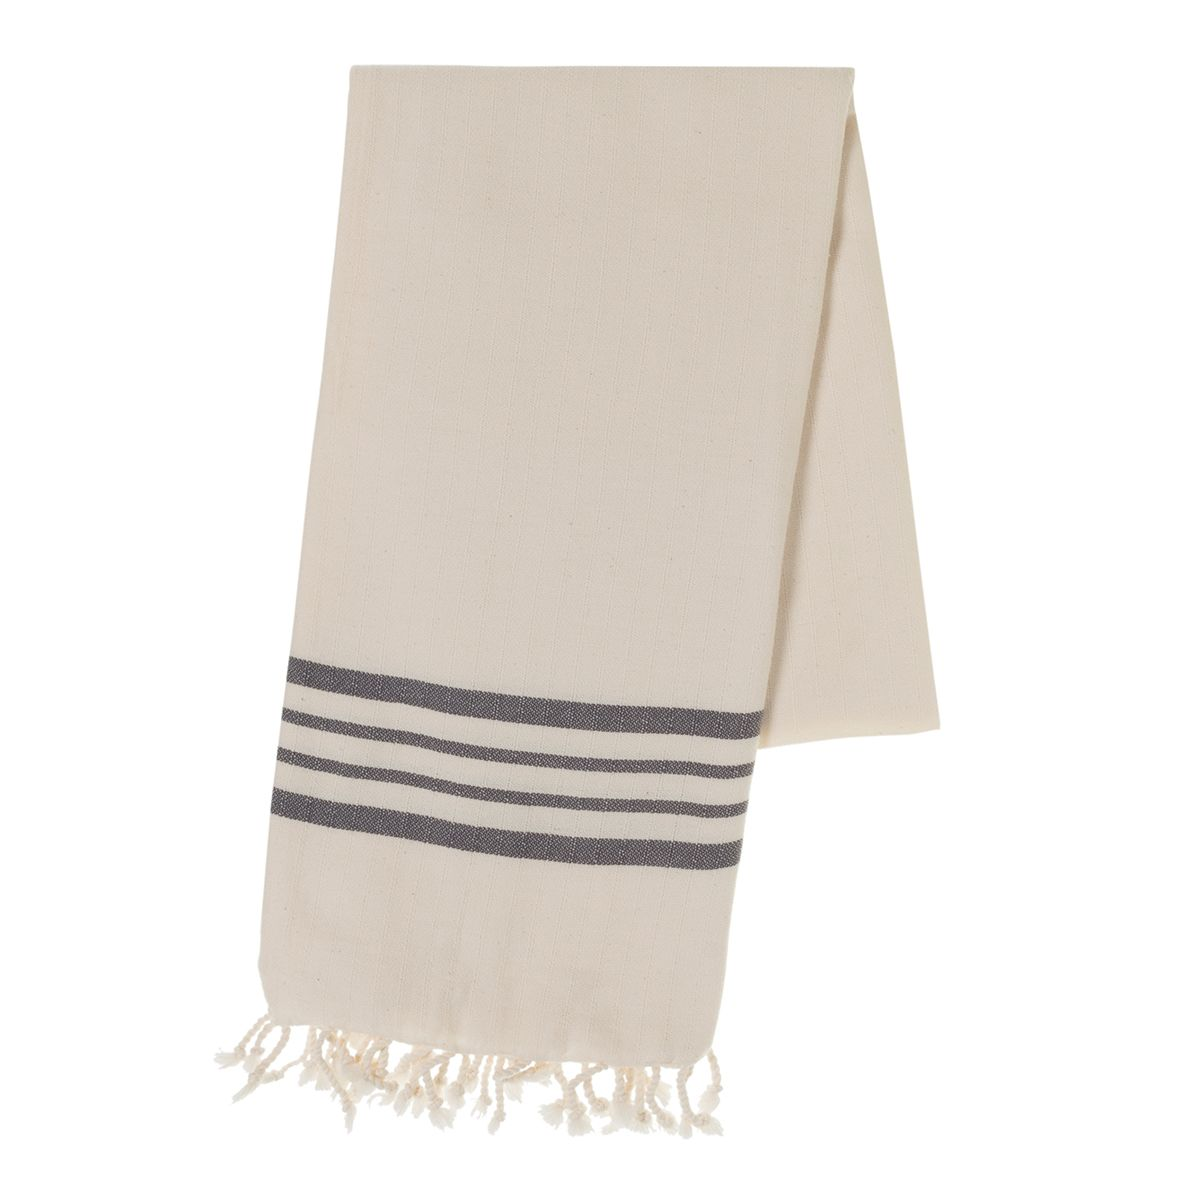 Peshtemal Sultan - Dark Grey Stripes